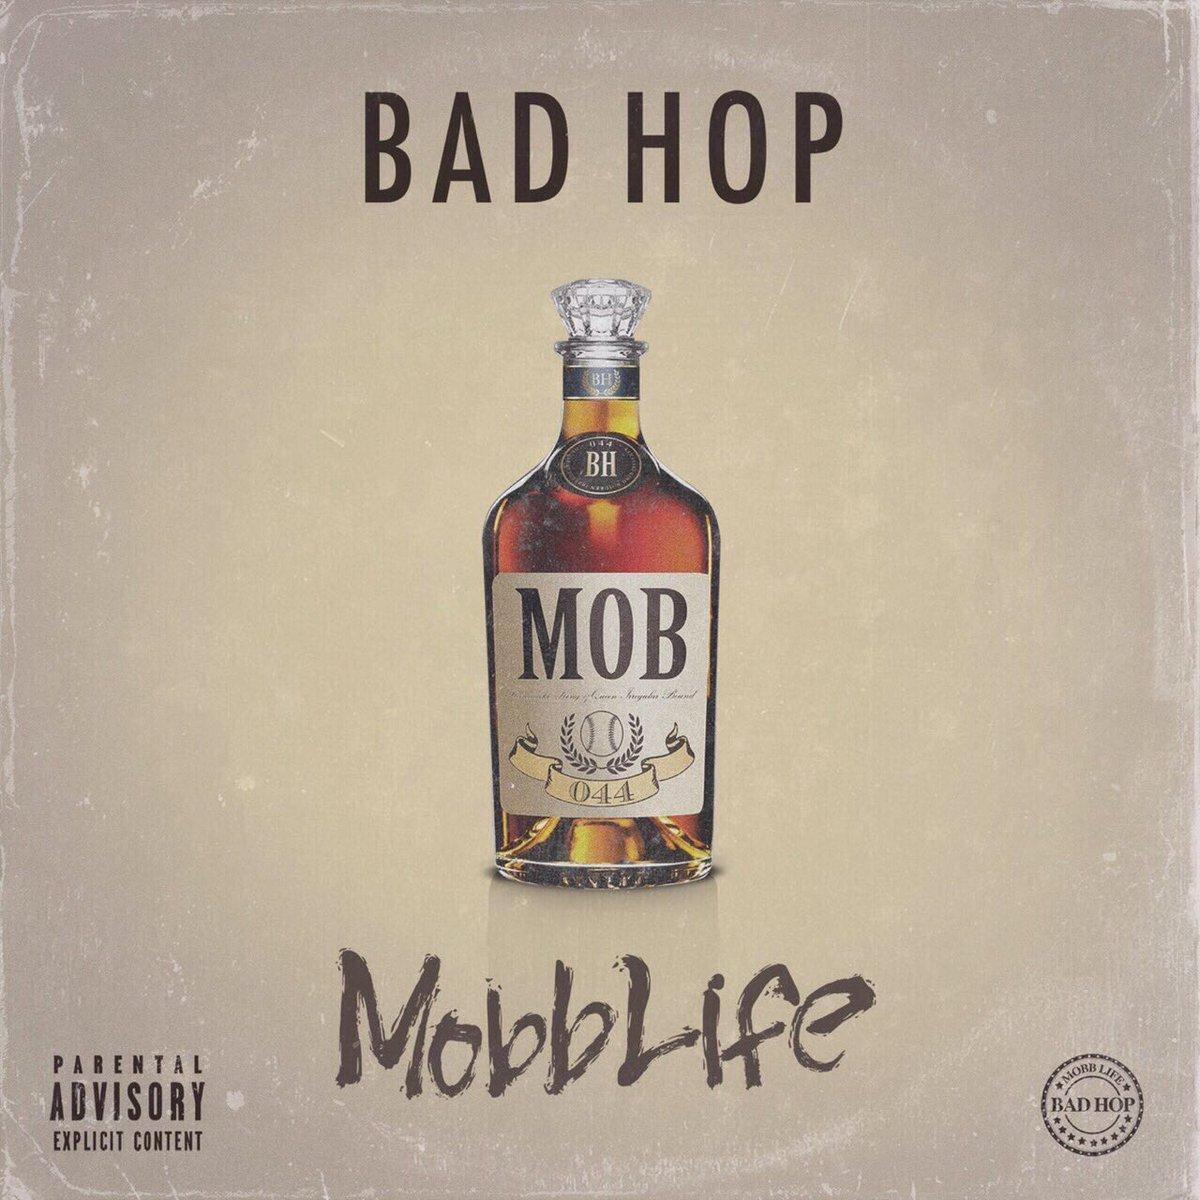 🚨New Audio公開🚨  BAD HOP New Album 「Mobb Life」から  「Super Car - Tiji Jojo & Yellow Pato」  Official AudioがYouTubeにて公開🔥   https://t.co/5RInrTvr0a